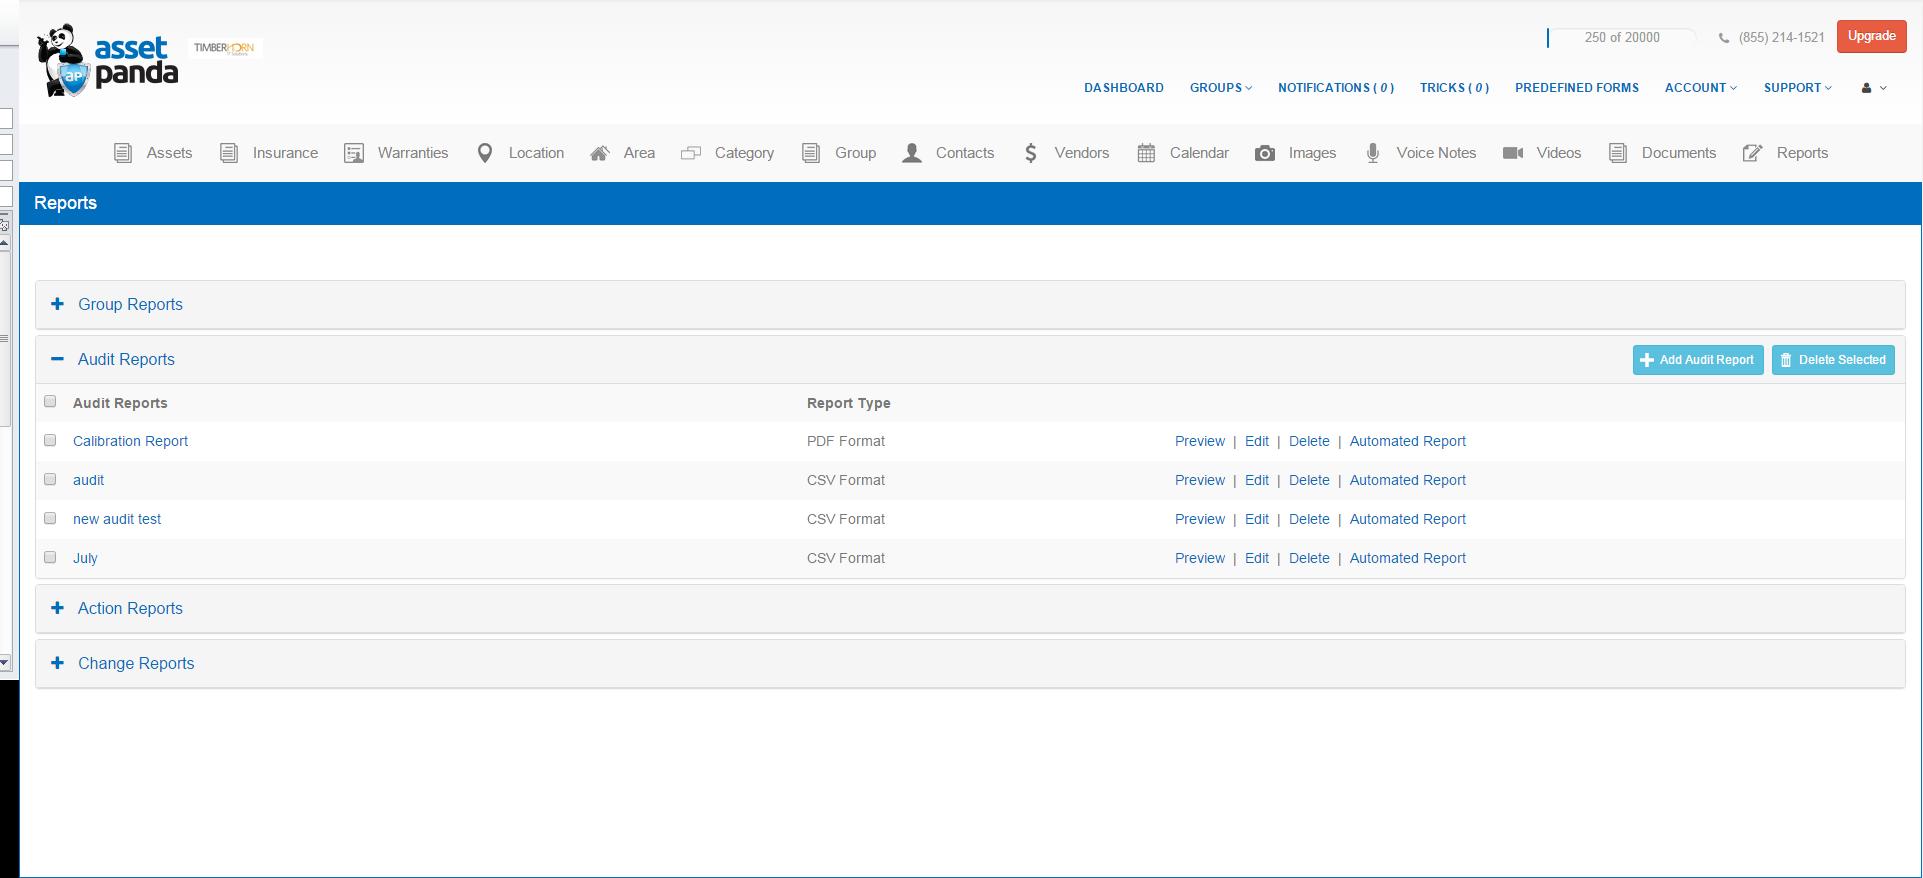 Asset Panda Software - Asset Panda custom reports